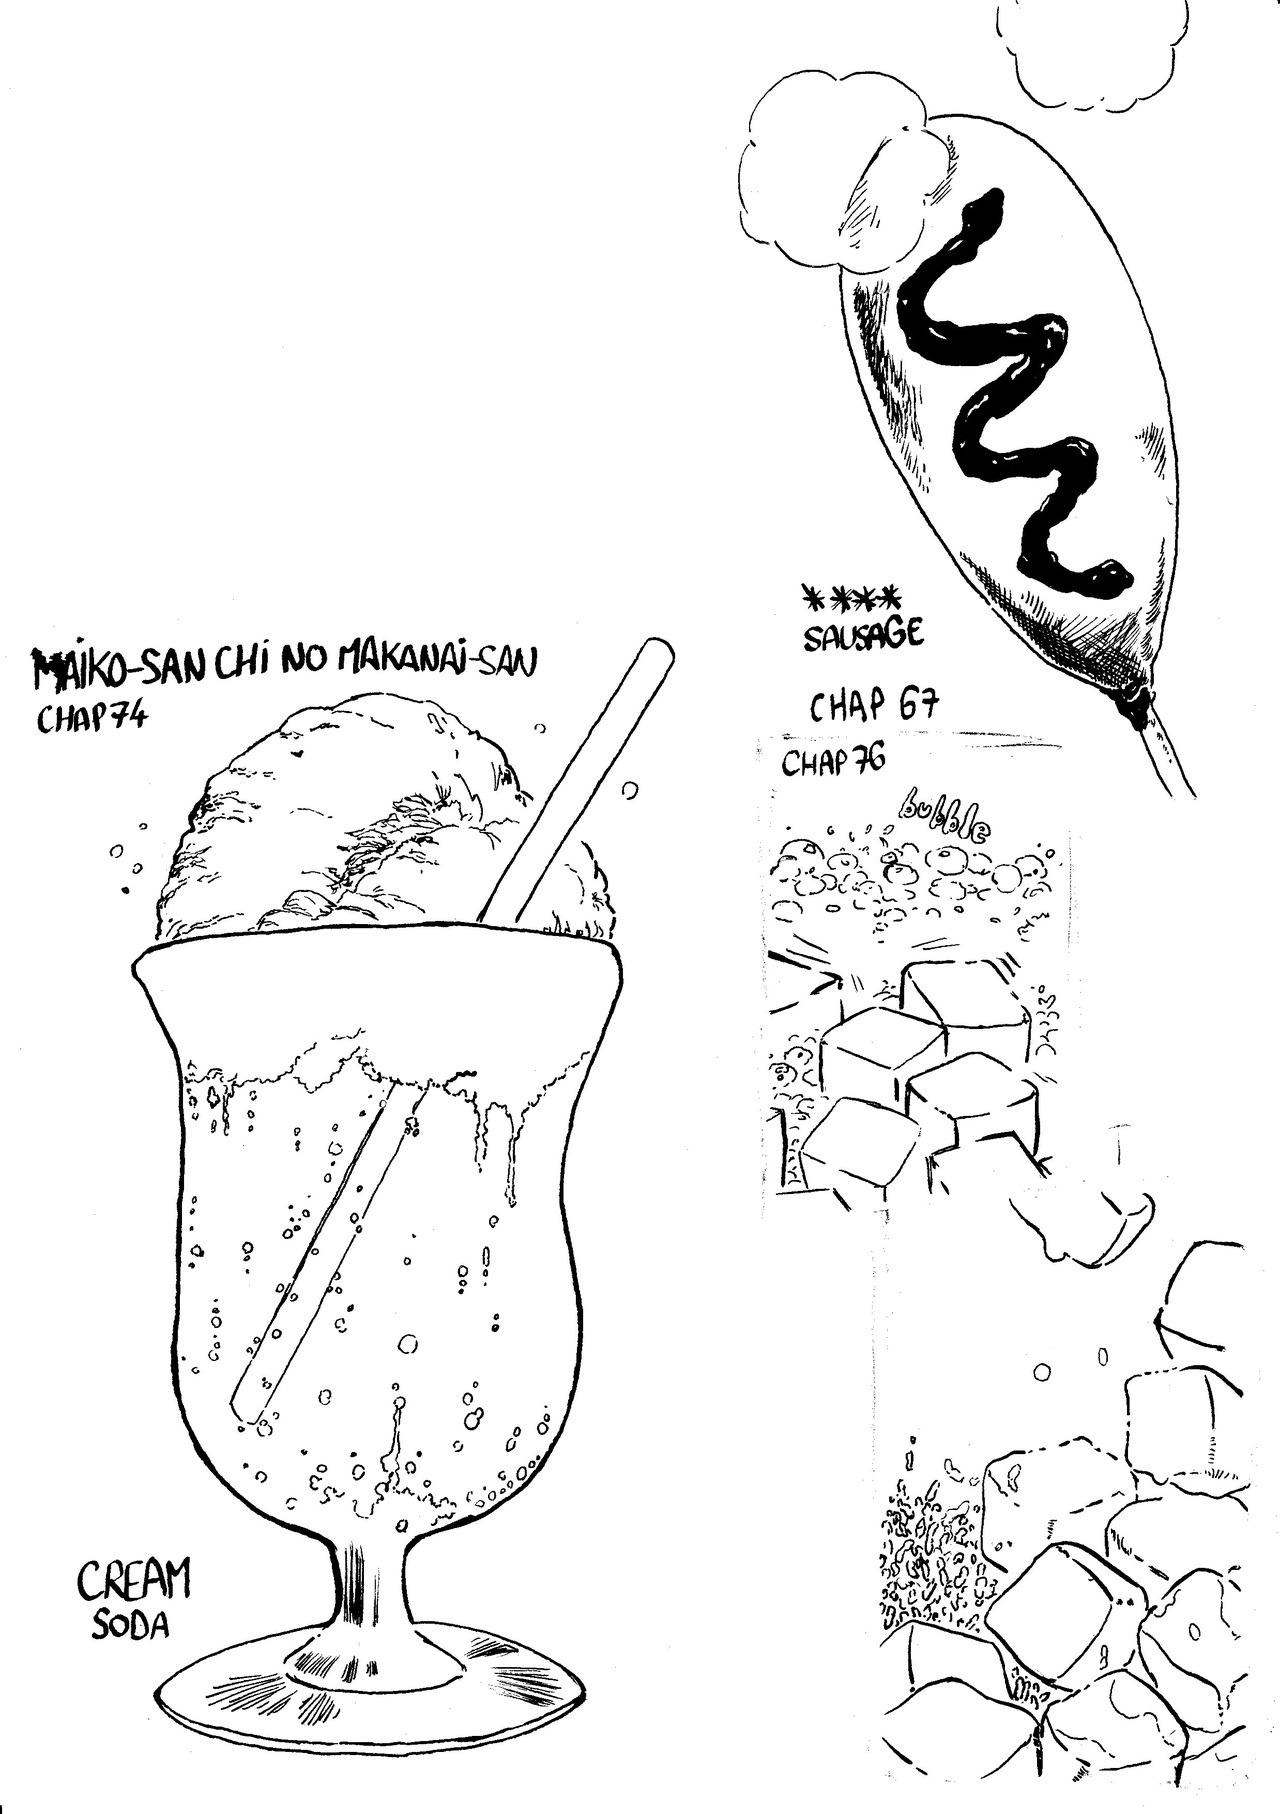 The hero at the raw ink — Bartholomew Kuma from One Piece